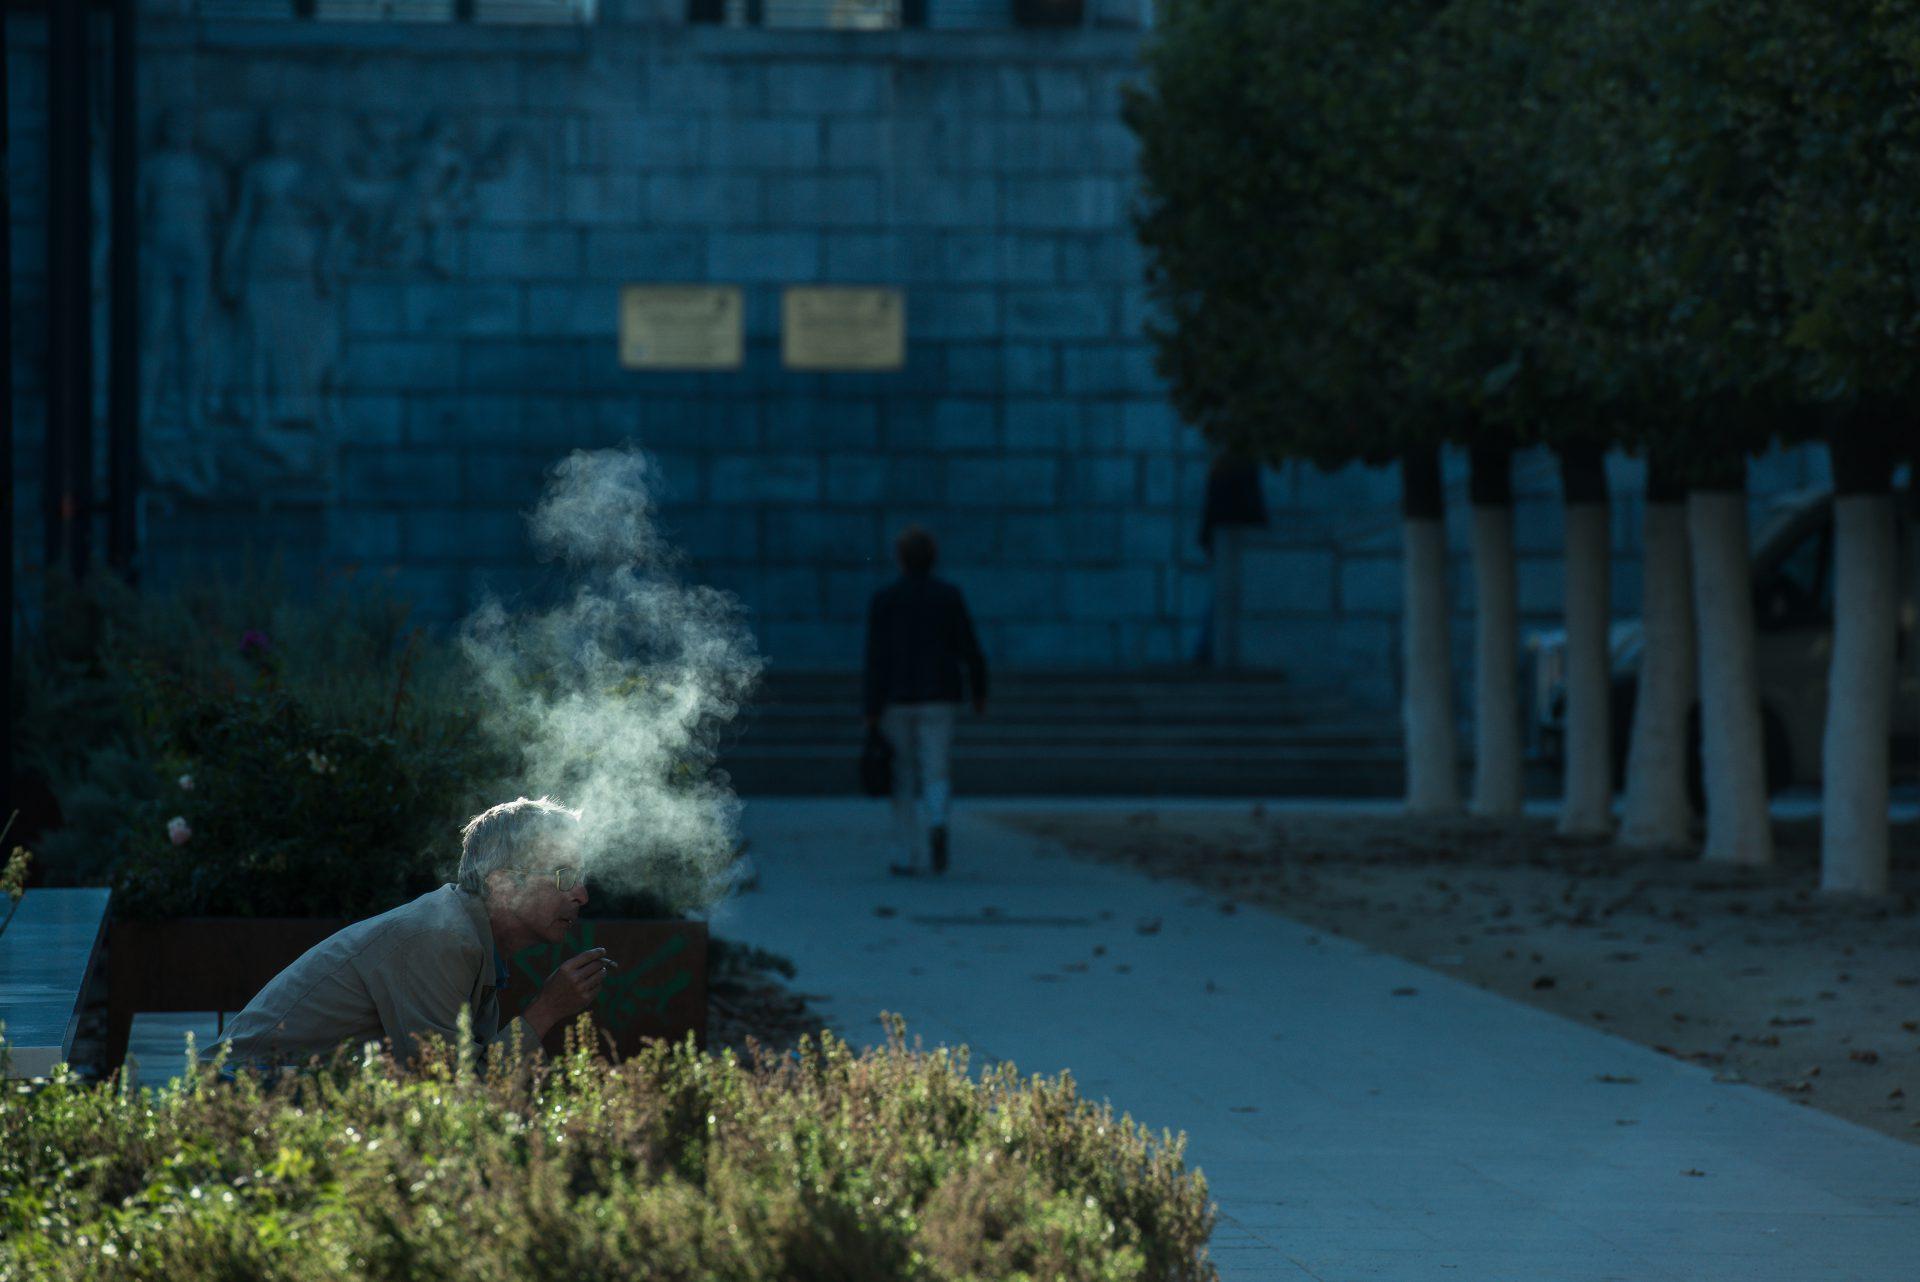 Street – 1 – Man en rook